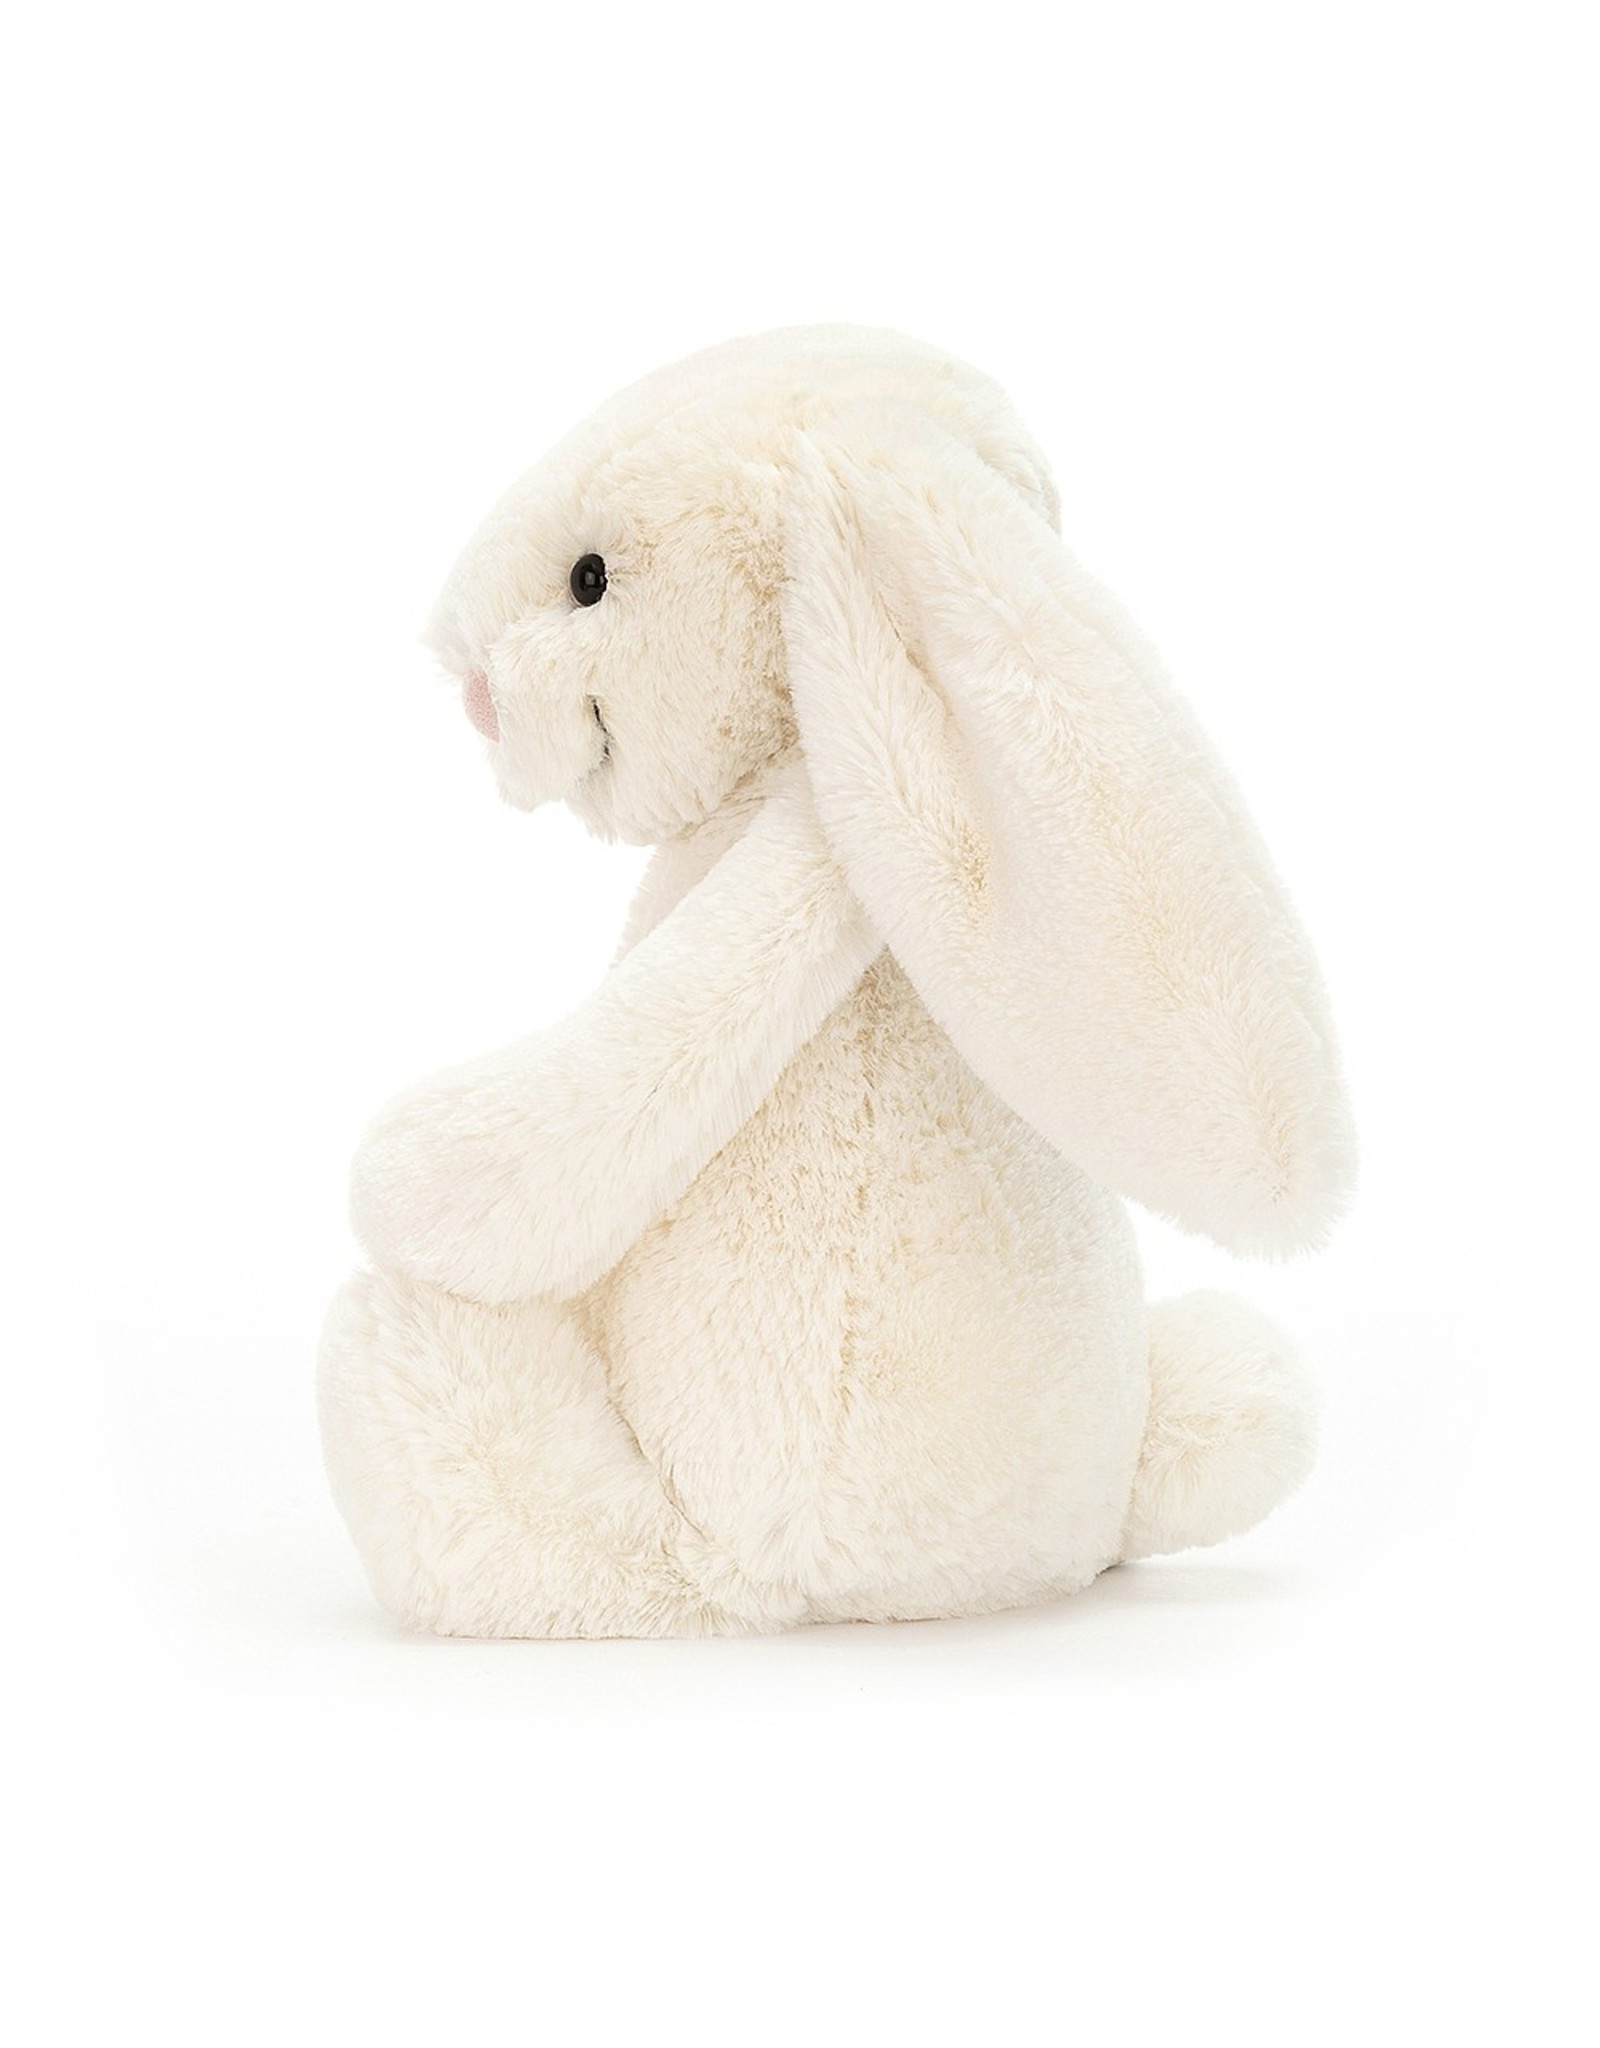 Jellycat Bashful bunny Cream - Huge